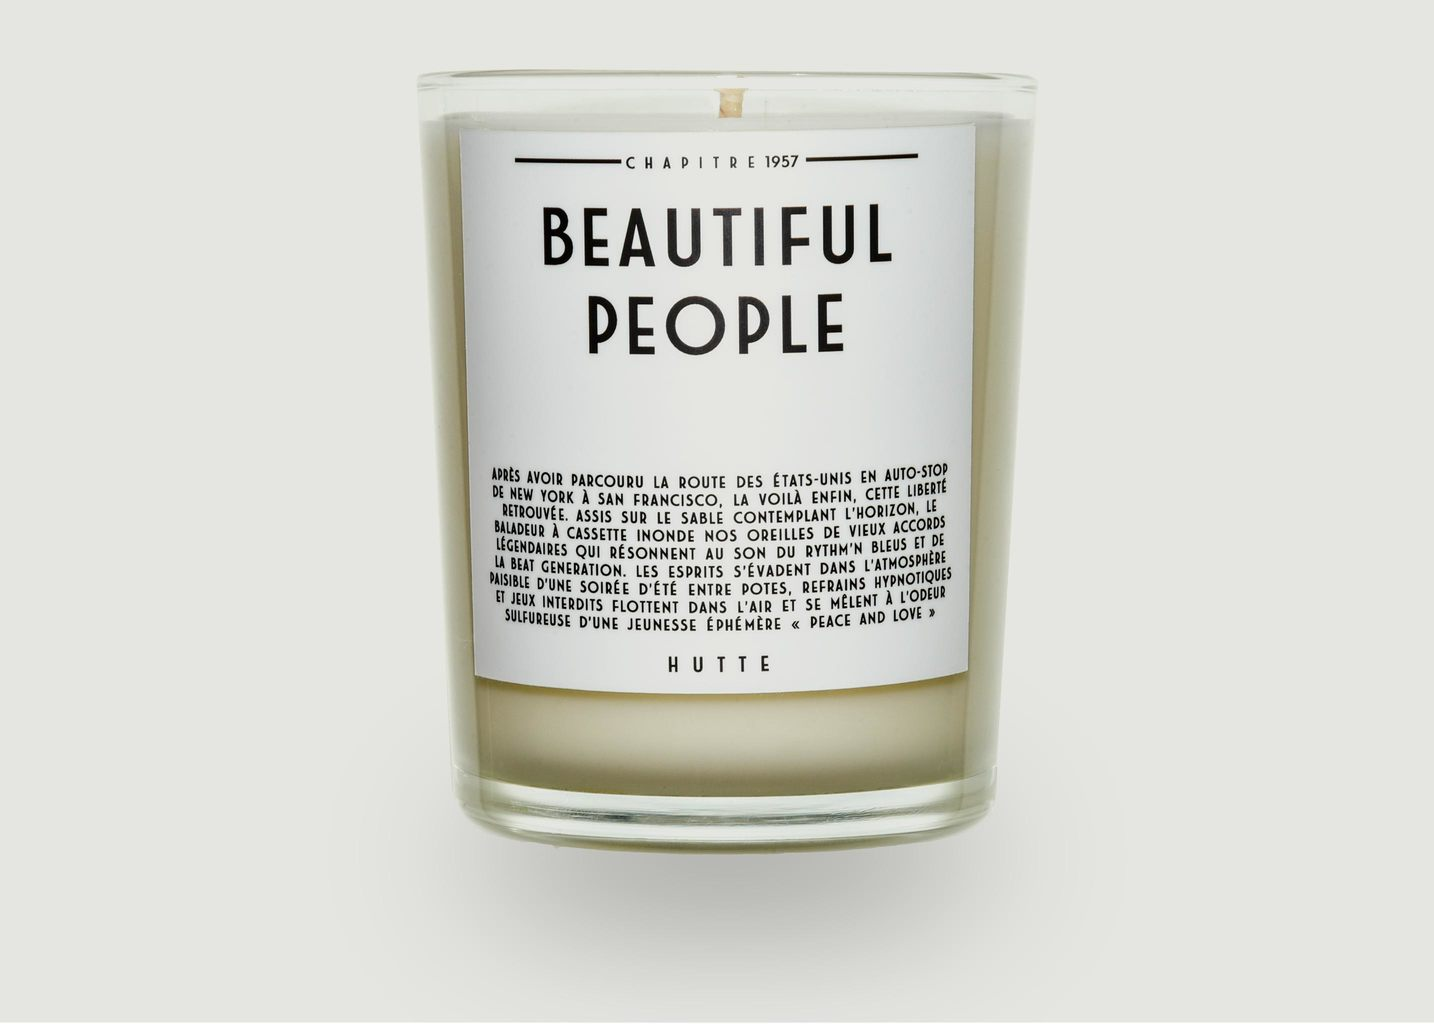 Bougie Parfumée Beautiful People 190 g - Hutte